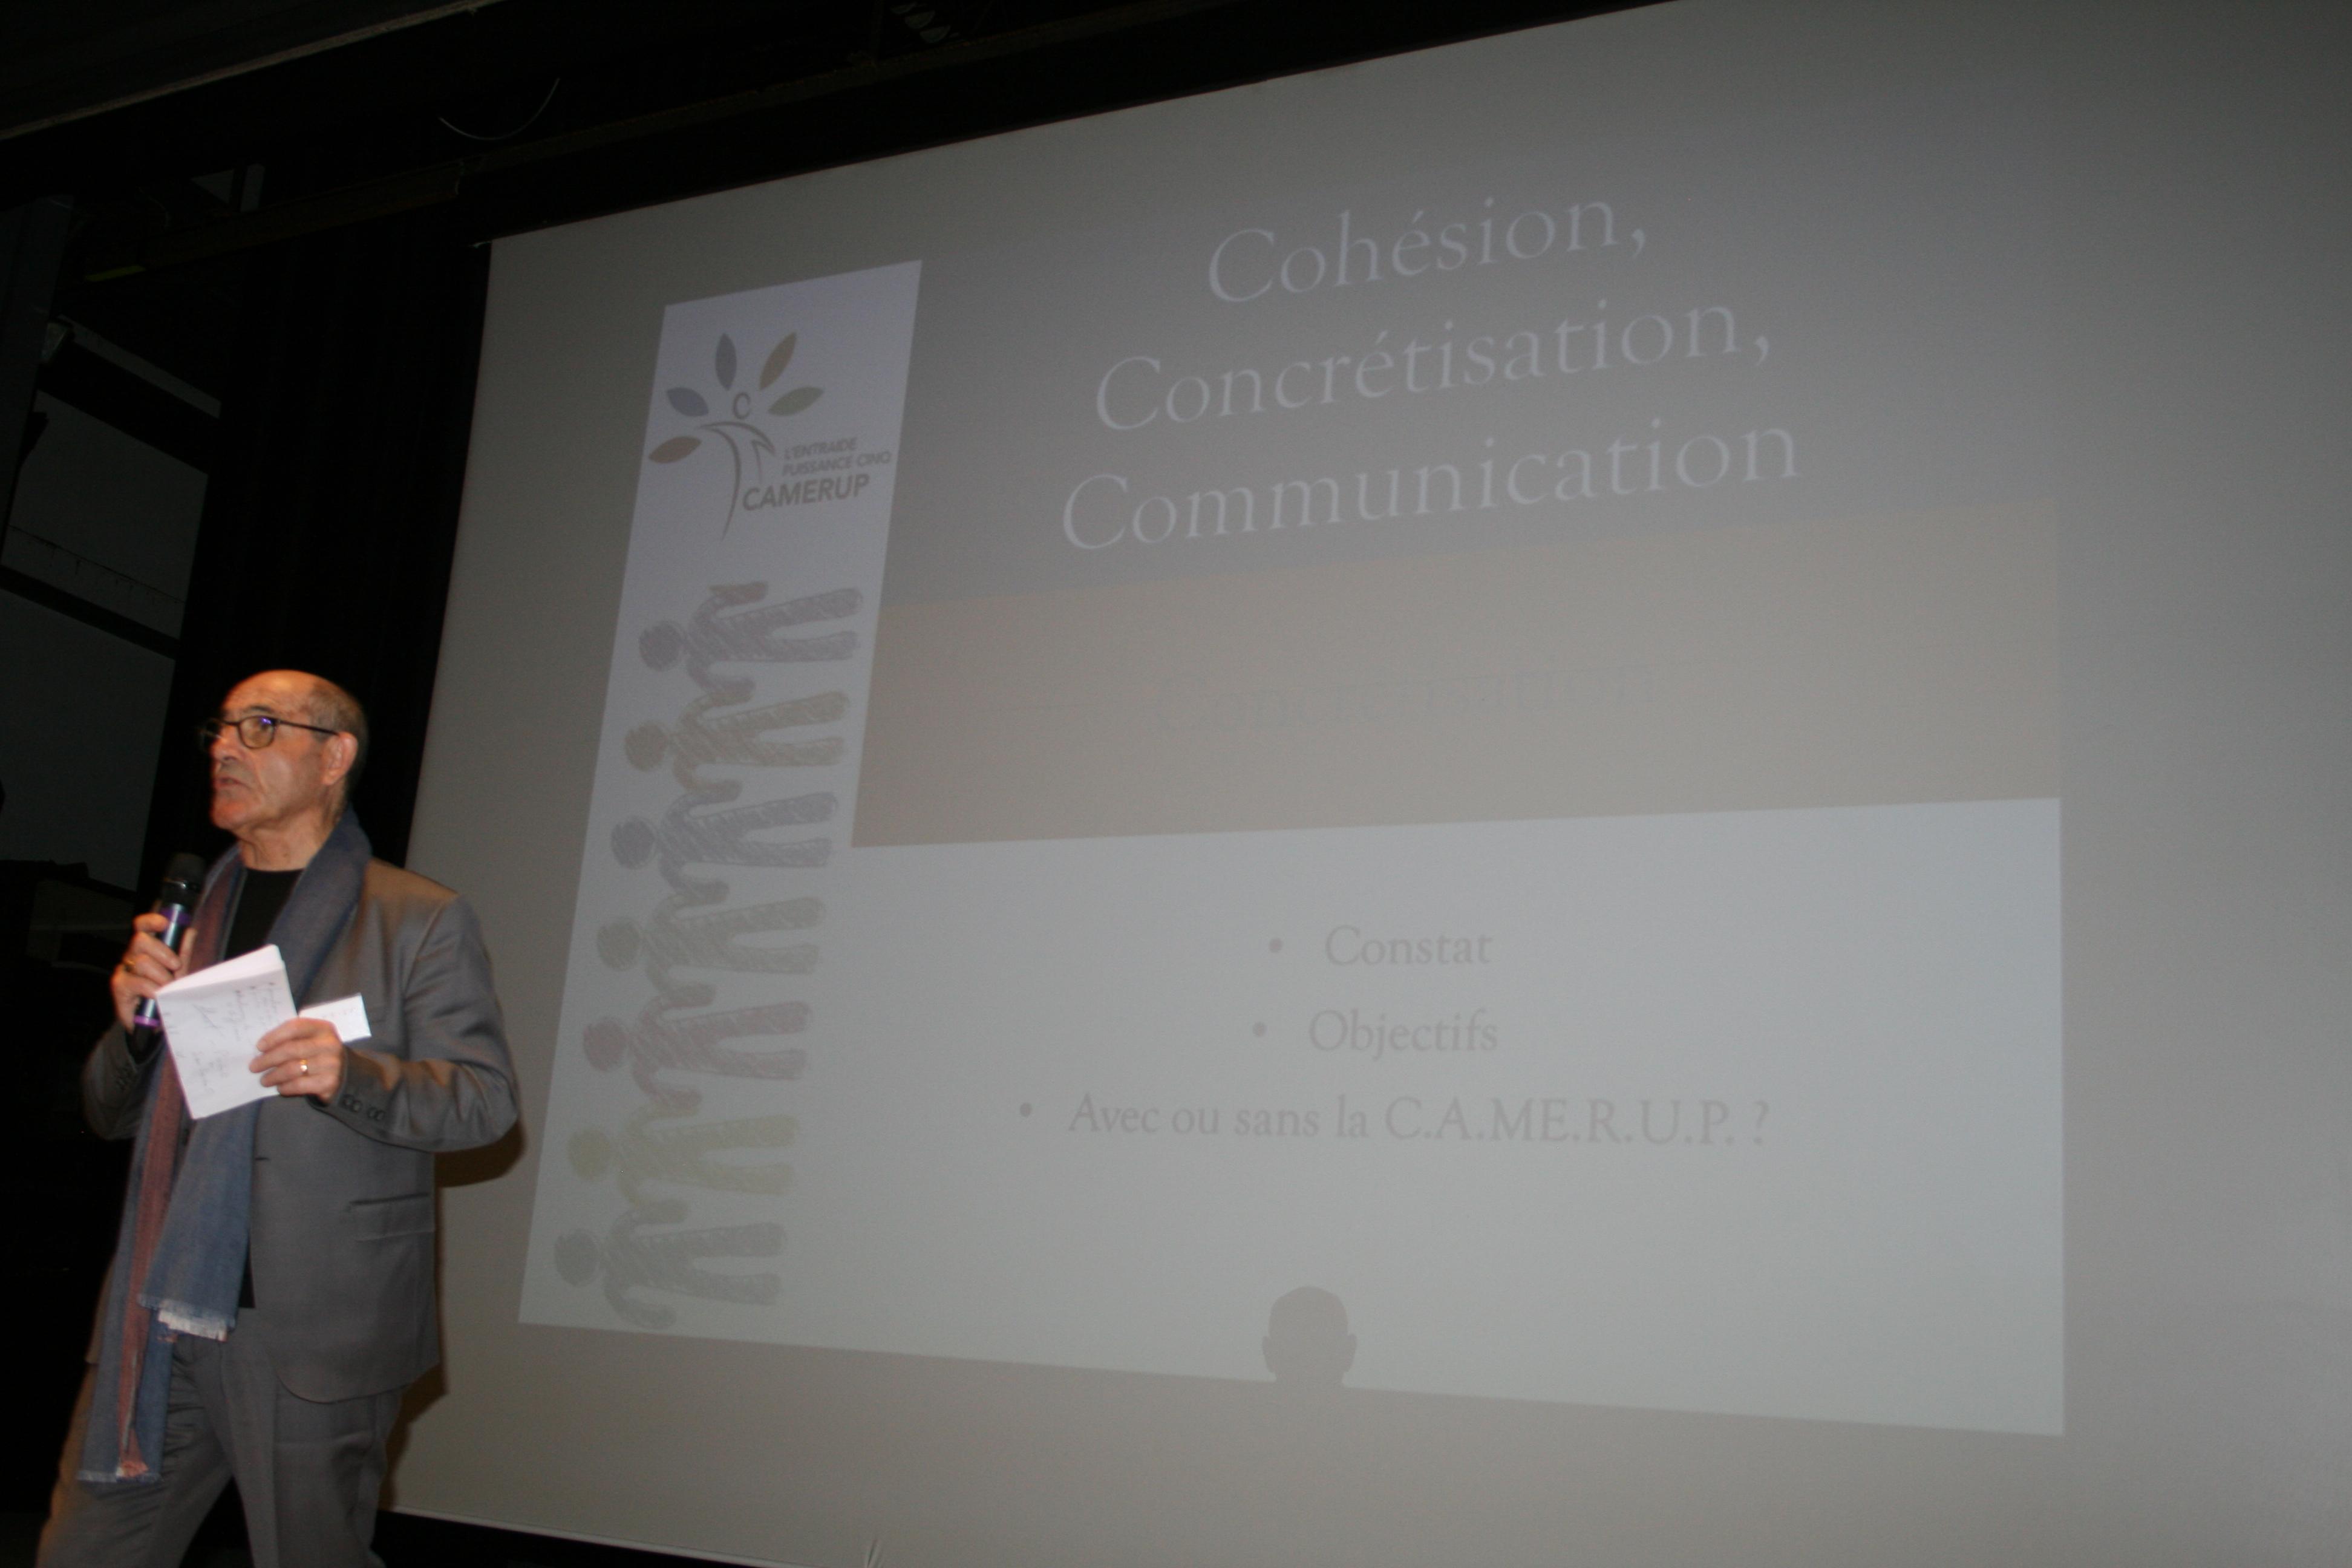 intervention concrétisation